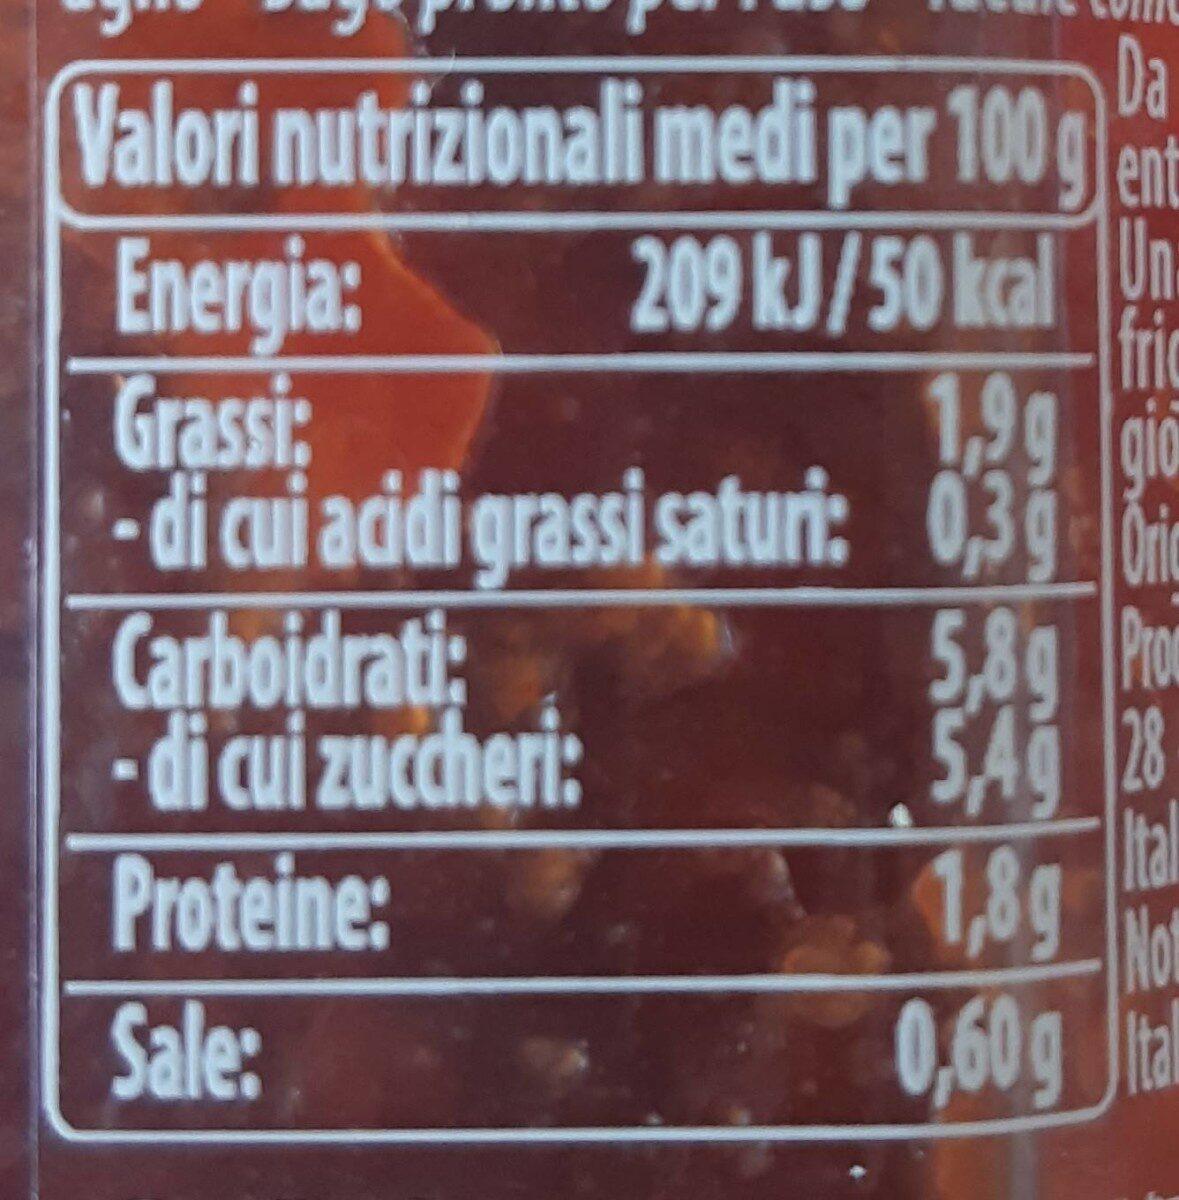 Mutti sugo semplice con peperoncino 280g - Voedingswaarden - it